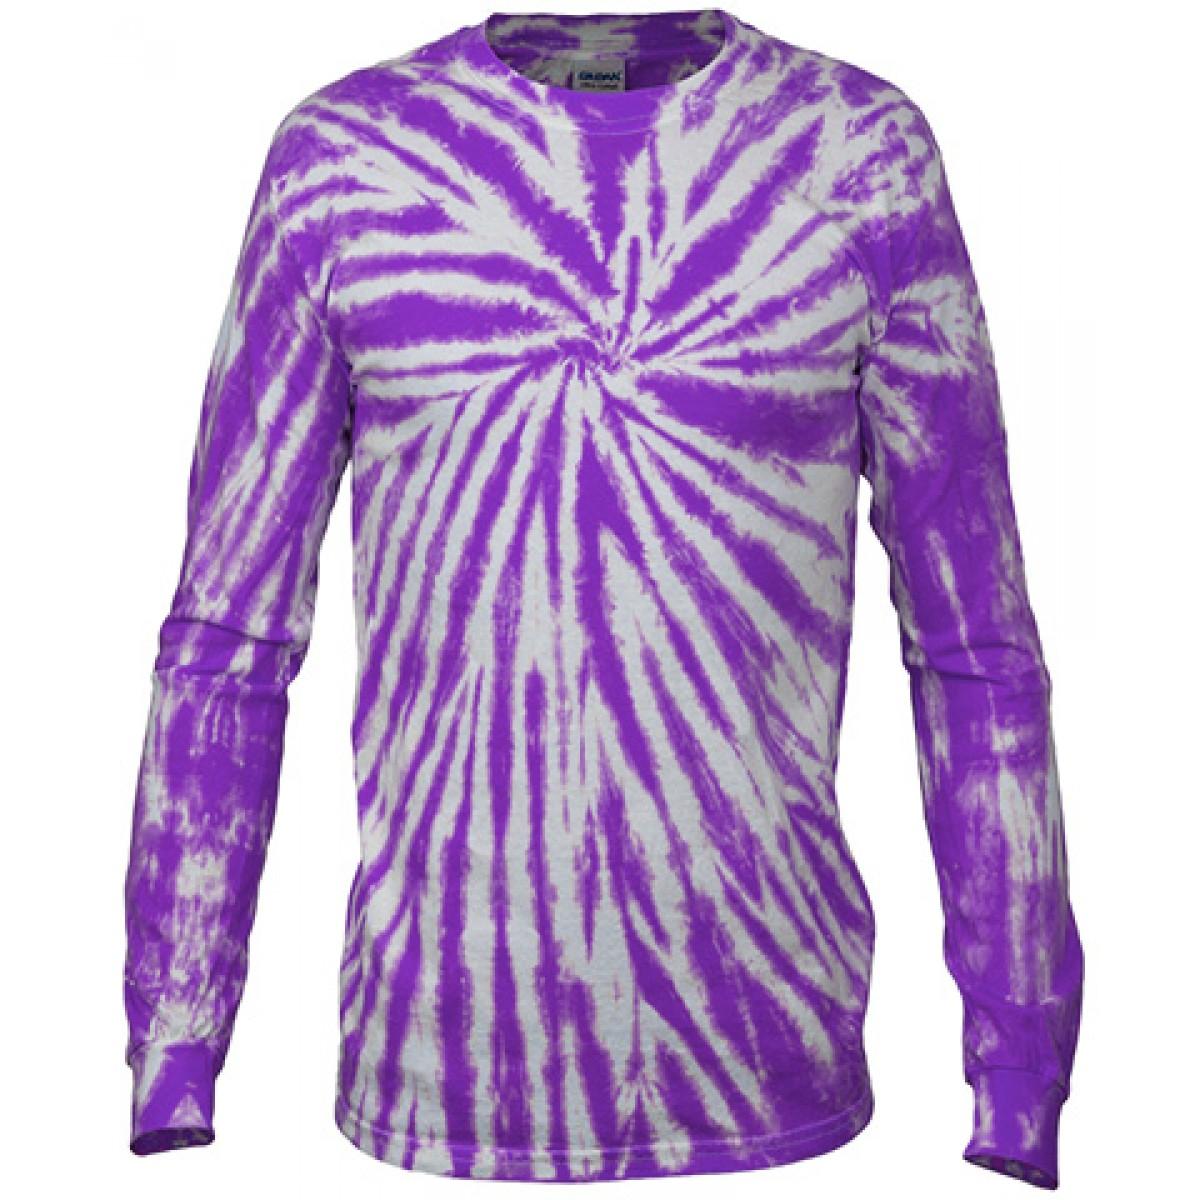 Multi Color Tie-Dye Long Sleeve Shirt -Fuscia-YL